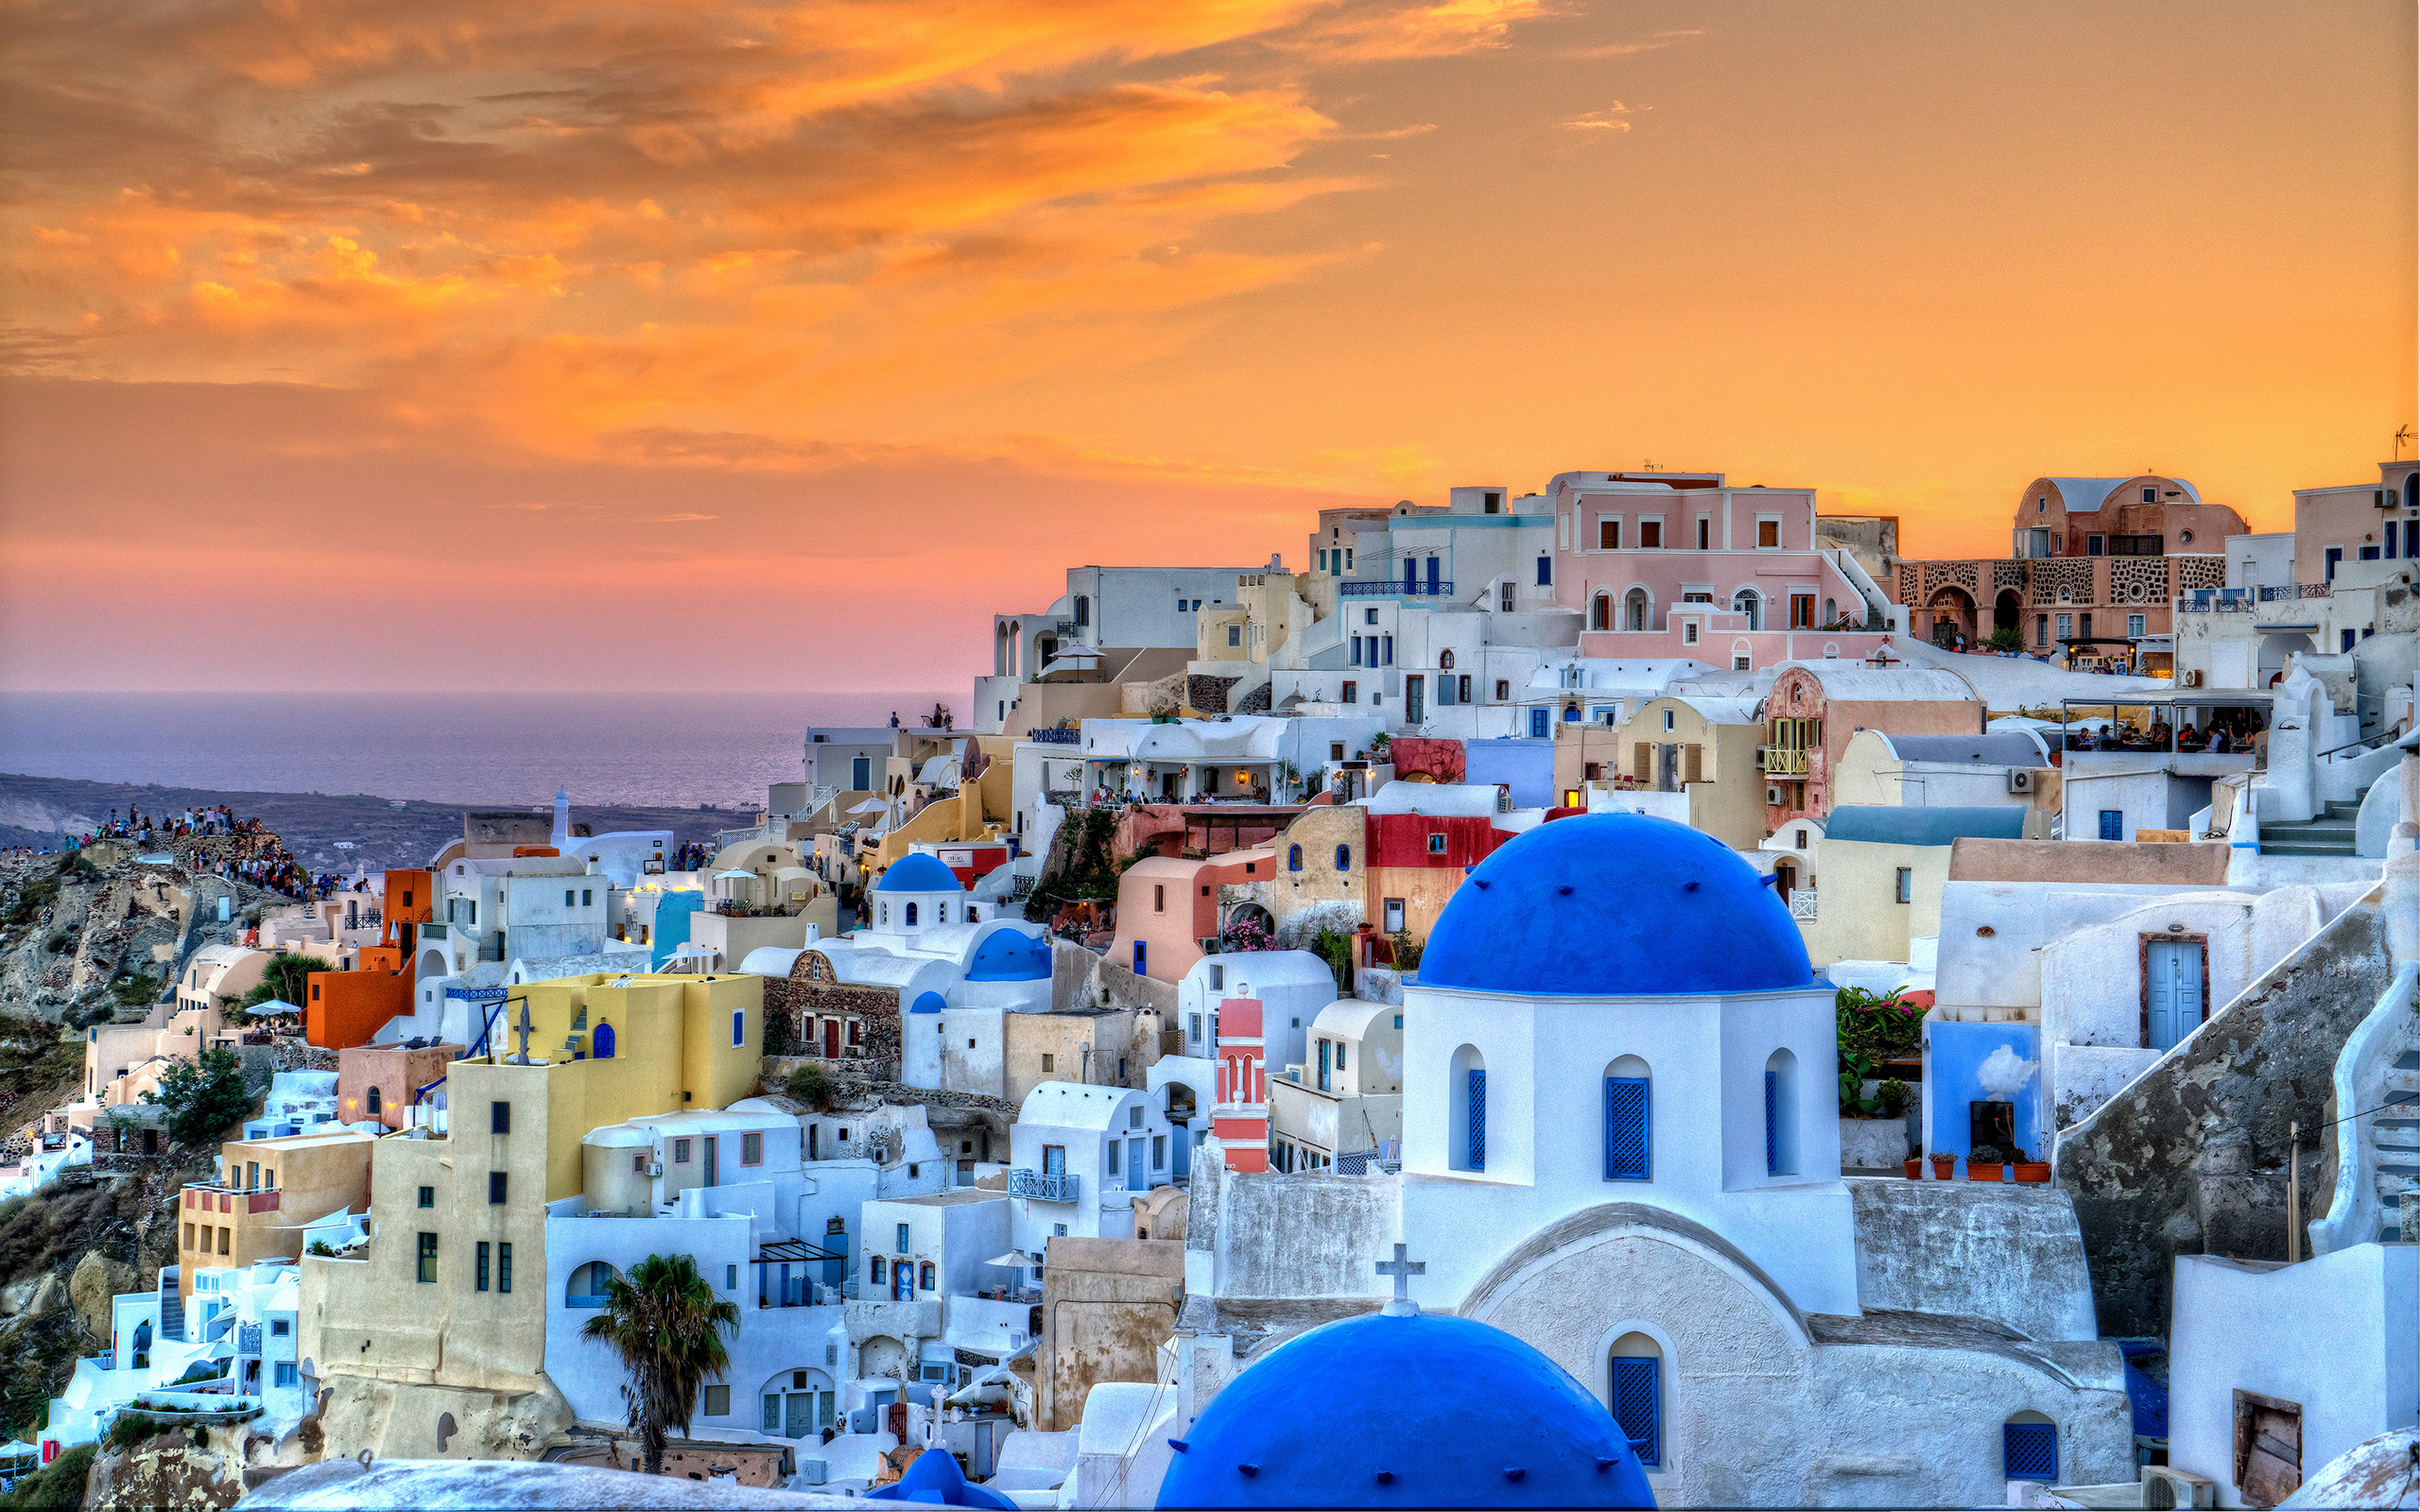 greece wallpapers santorini hd - photo #44